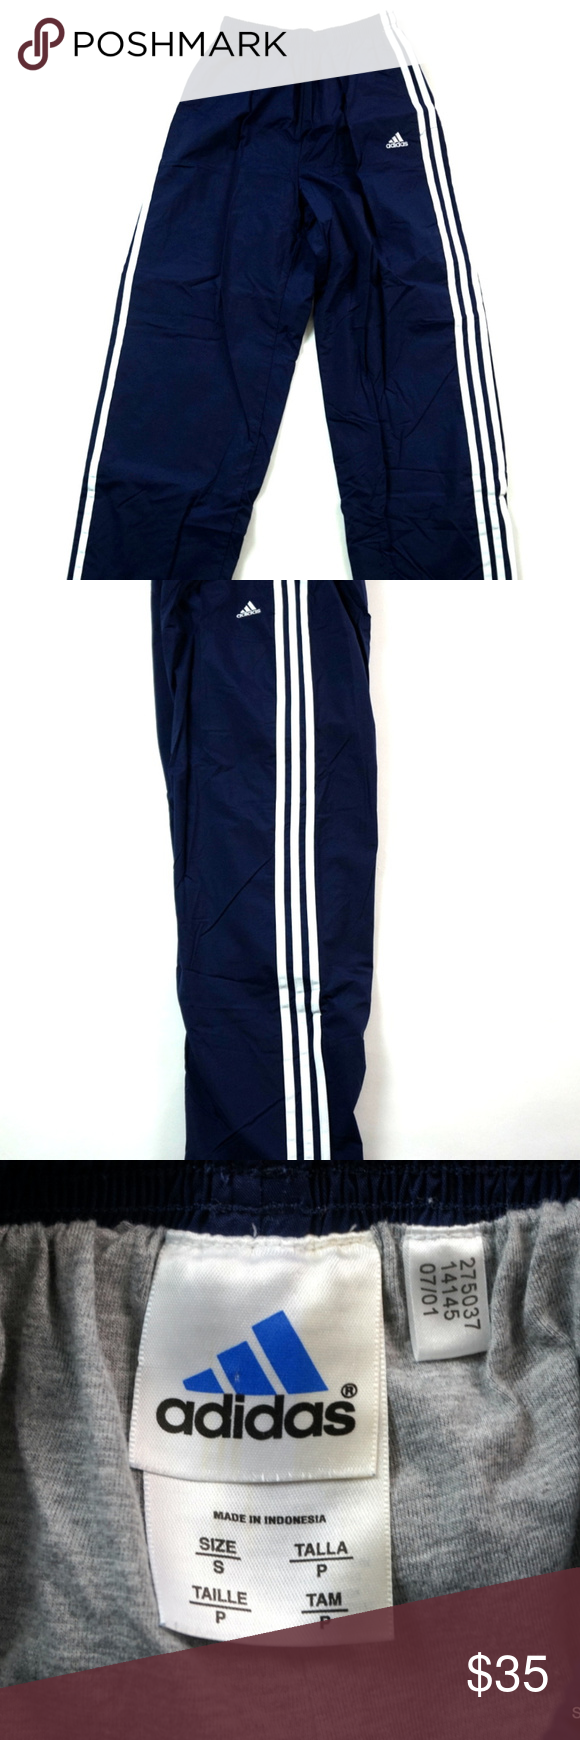 VTG 90s Men's Adidas Lined Windpants Sz Small